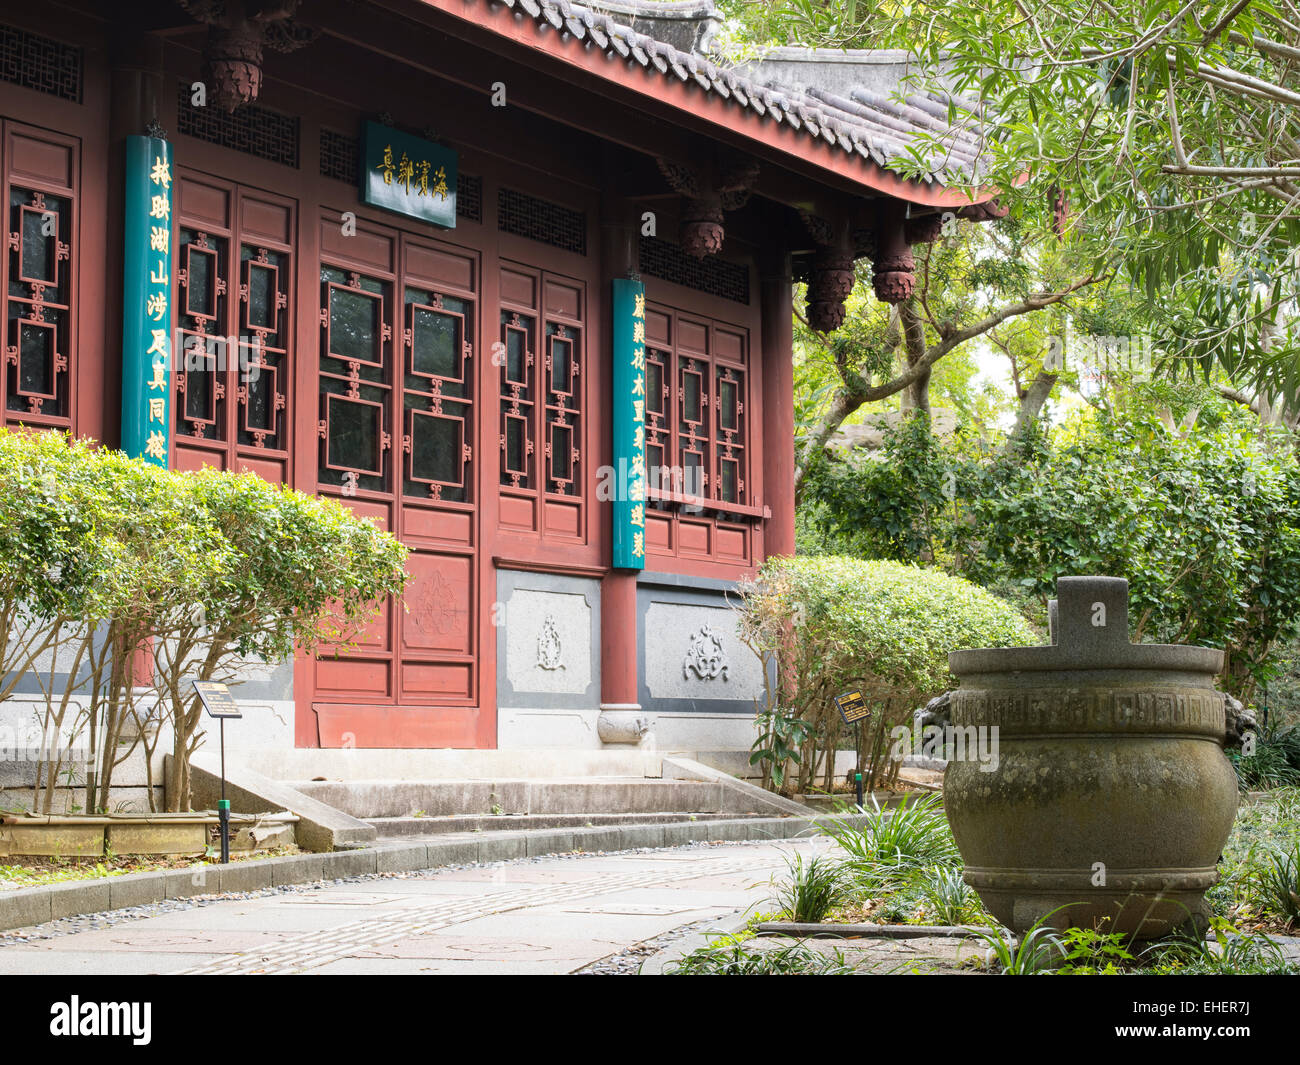 Fukushuen / Fukusyuen / Fukushu Garden, Naha City. Okinawa, Japan. Based on gardens of Fuzhou City, China. - Stock Image